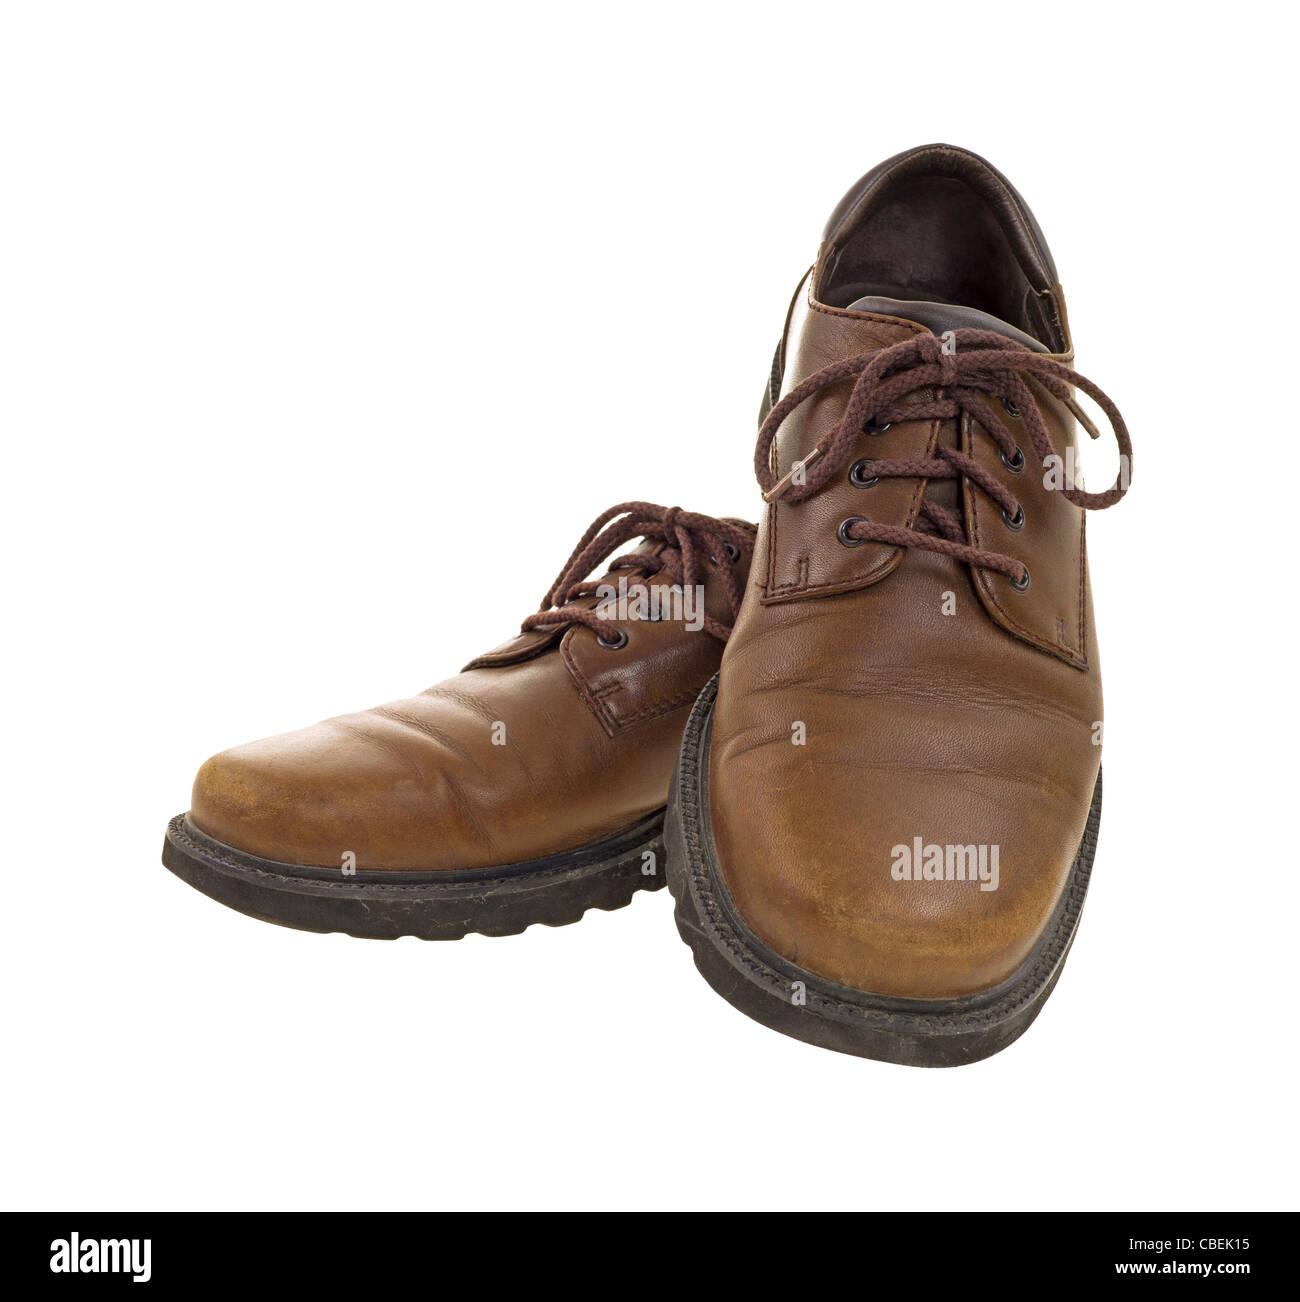 Leather Uppers Imágenes De Stock & Leather Uppers Fotos De